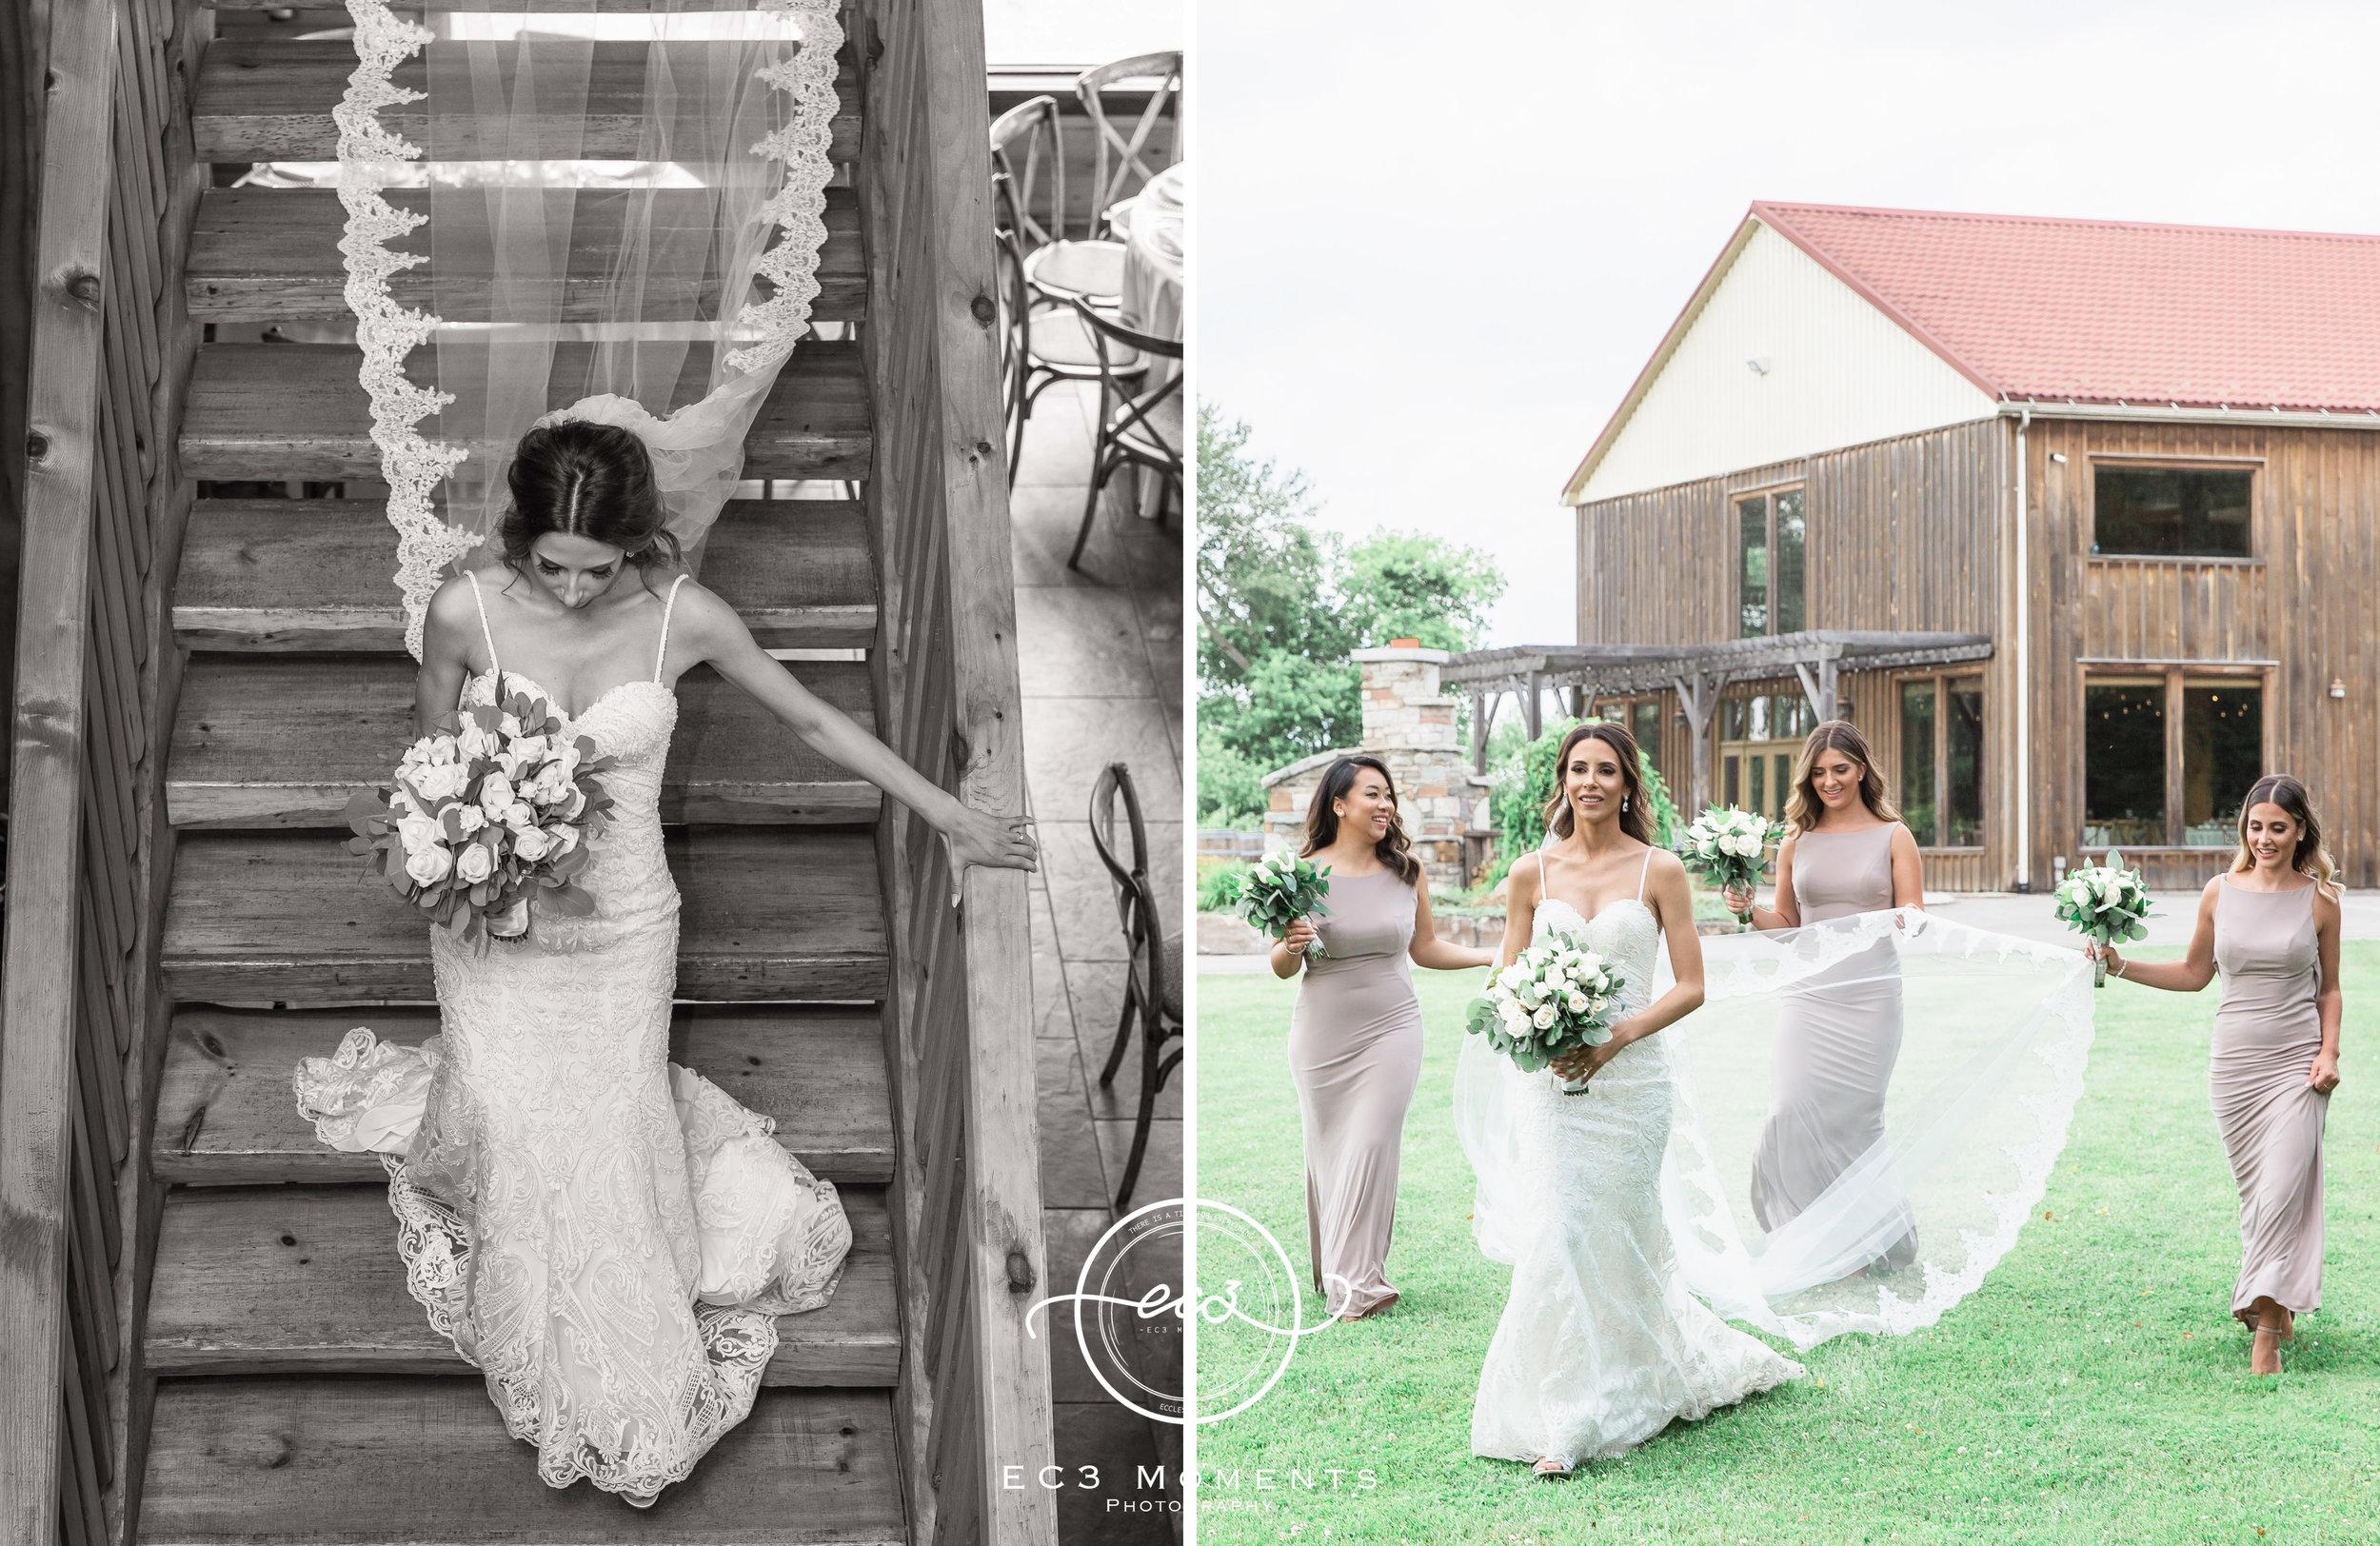 Laura & Ryan Holland Marsh Wineries Wedding 23.jpg